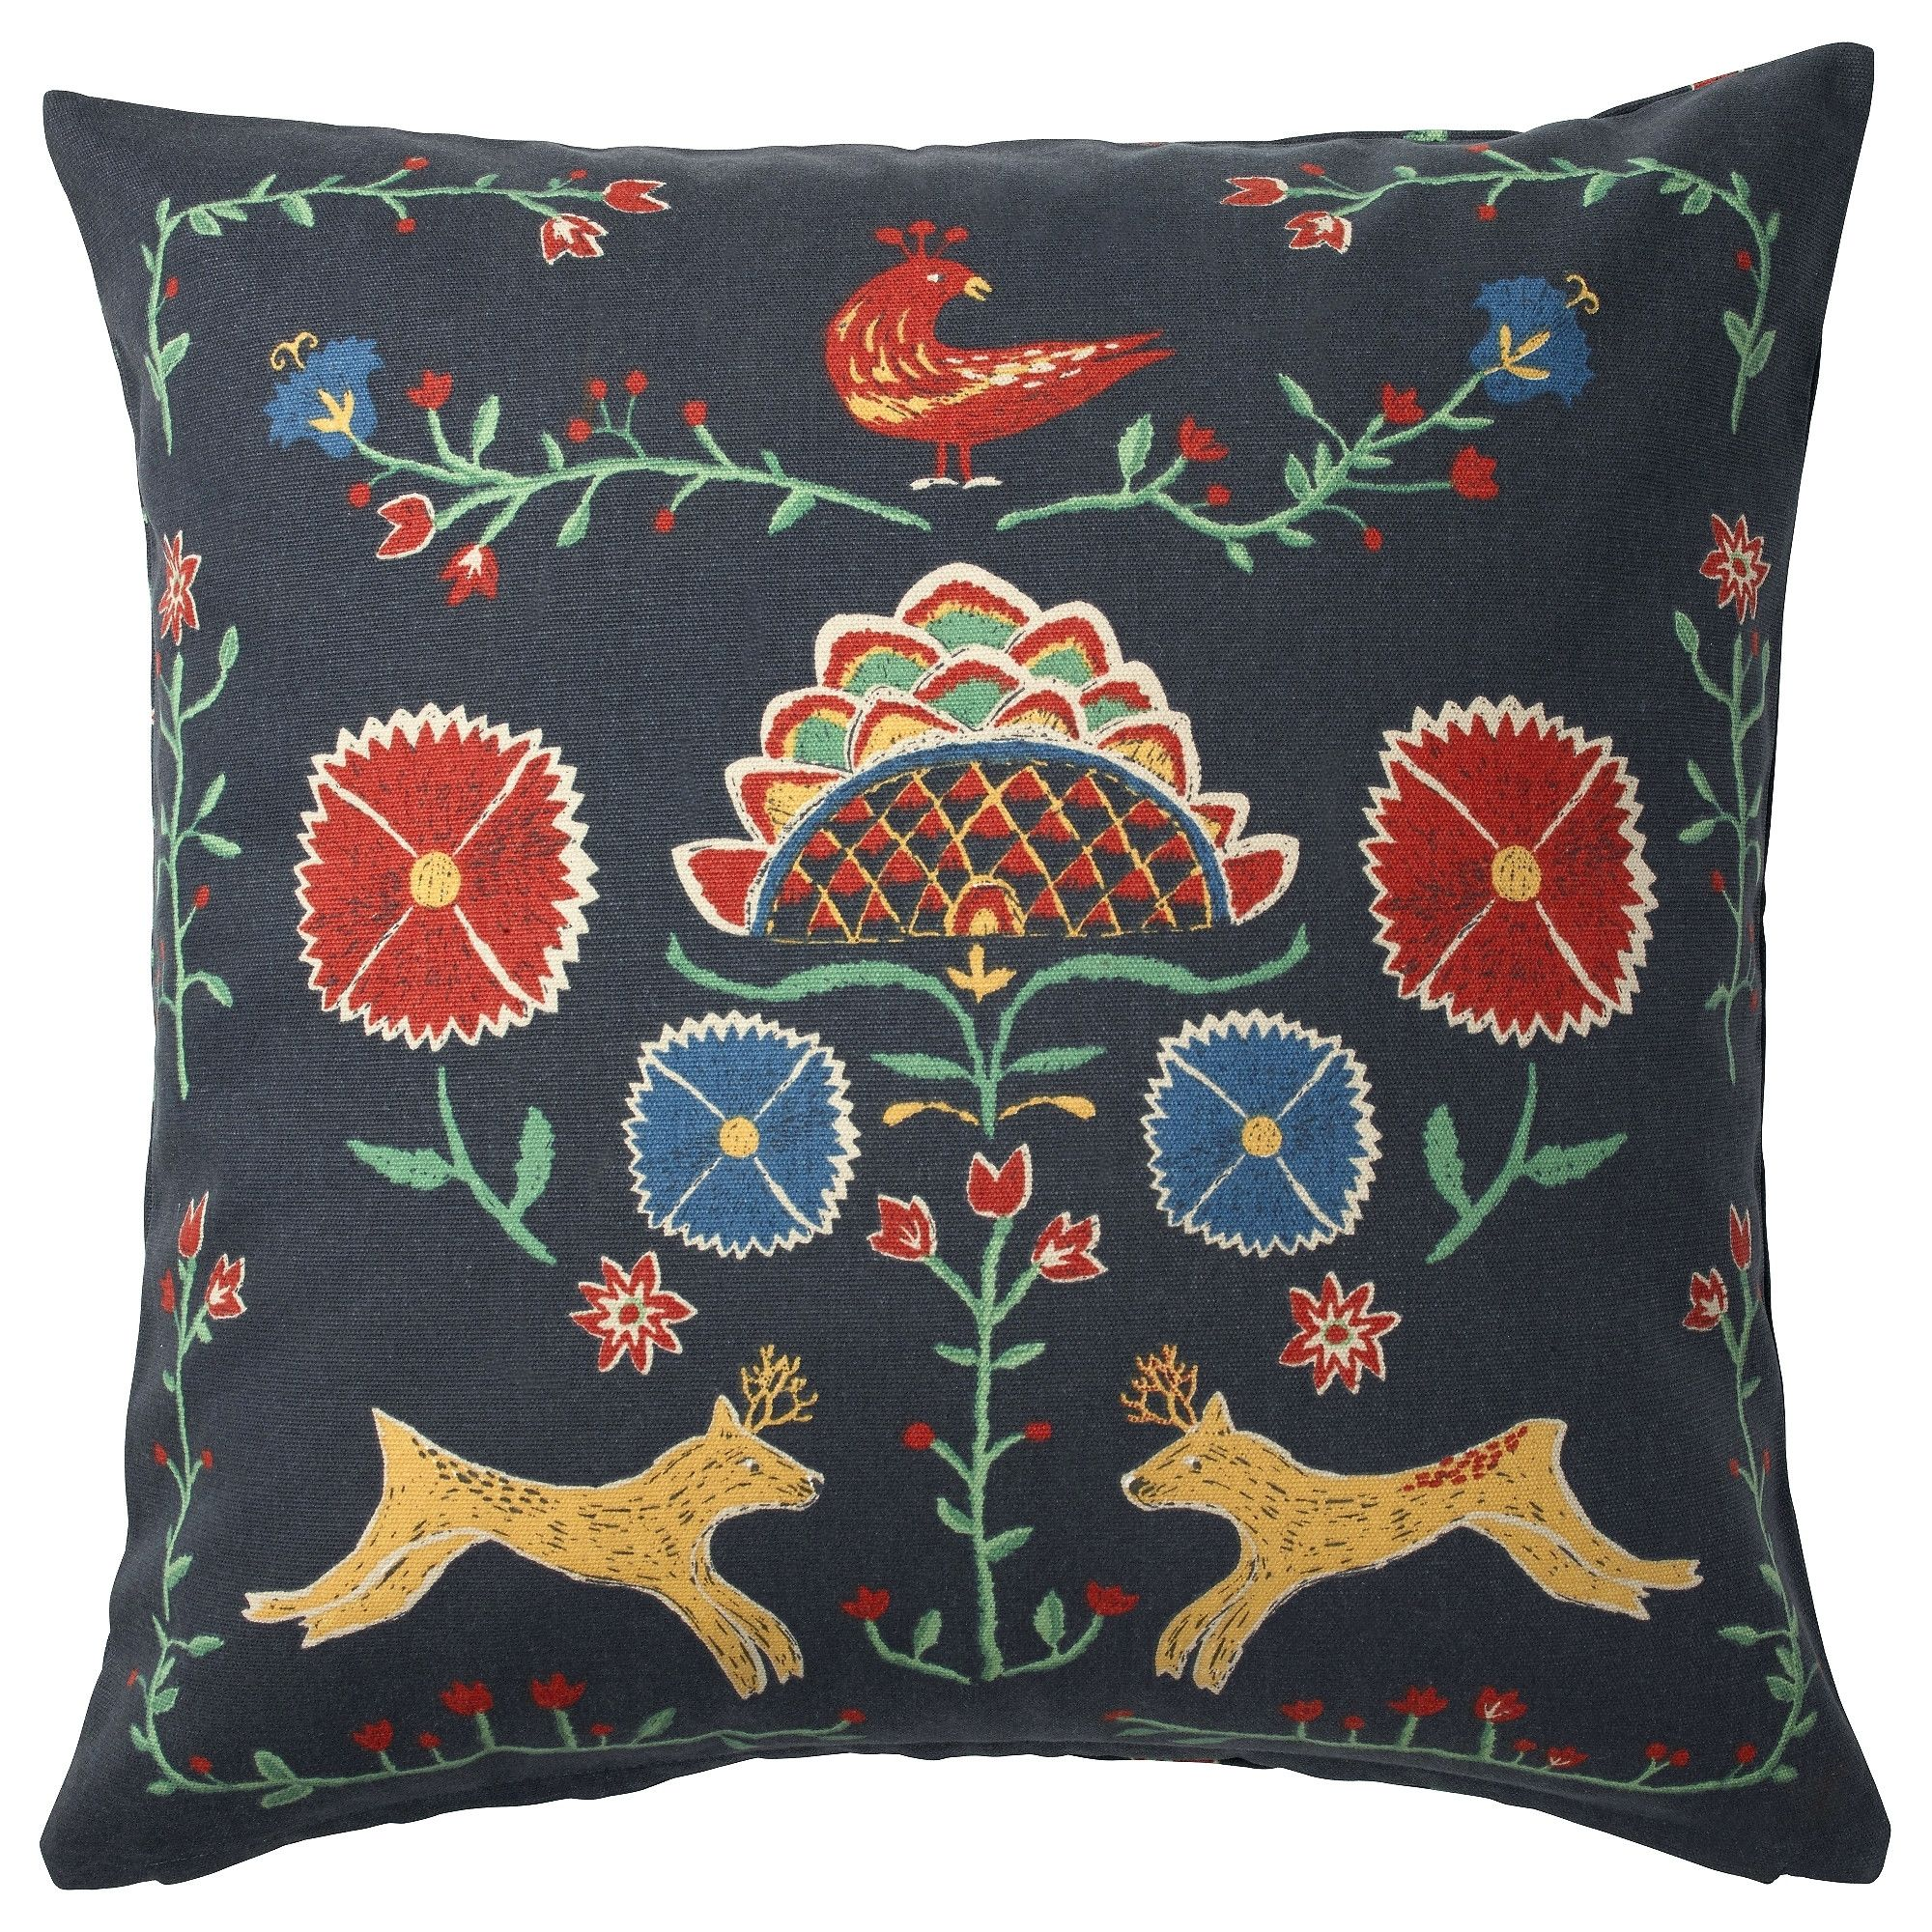 24 Inch Pillow Covers Velvet Ikea Renrepe Cushion Cover The